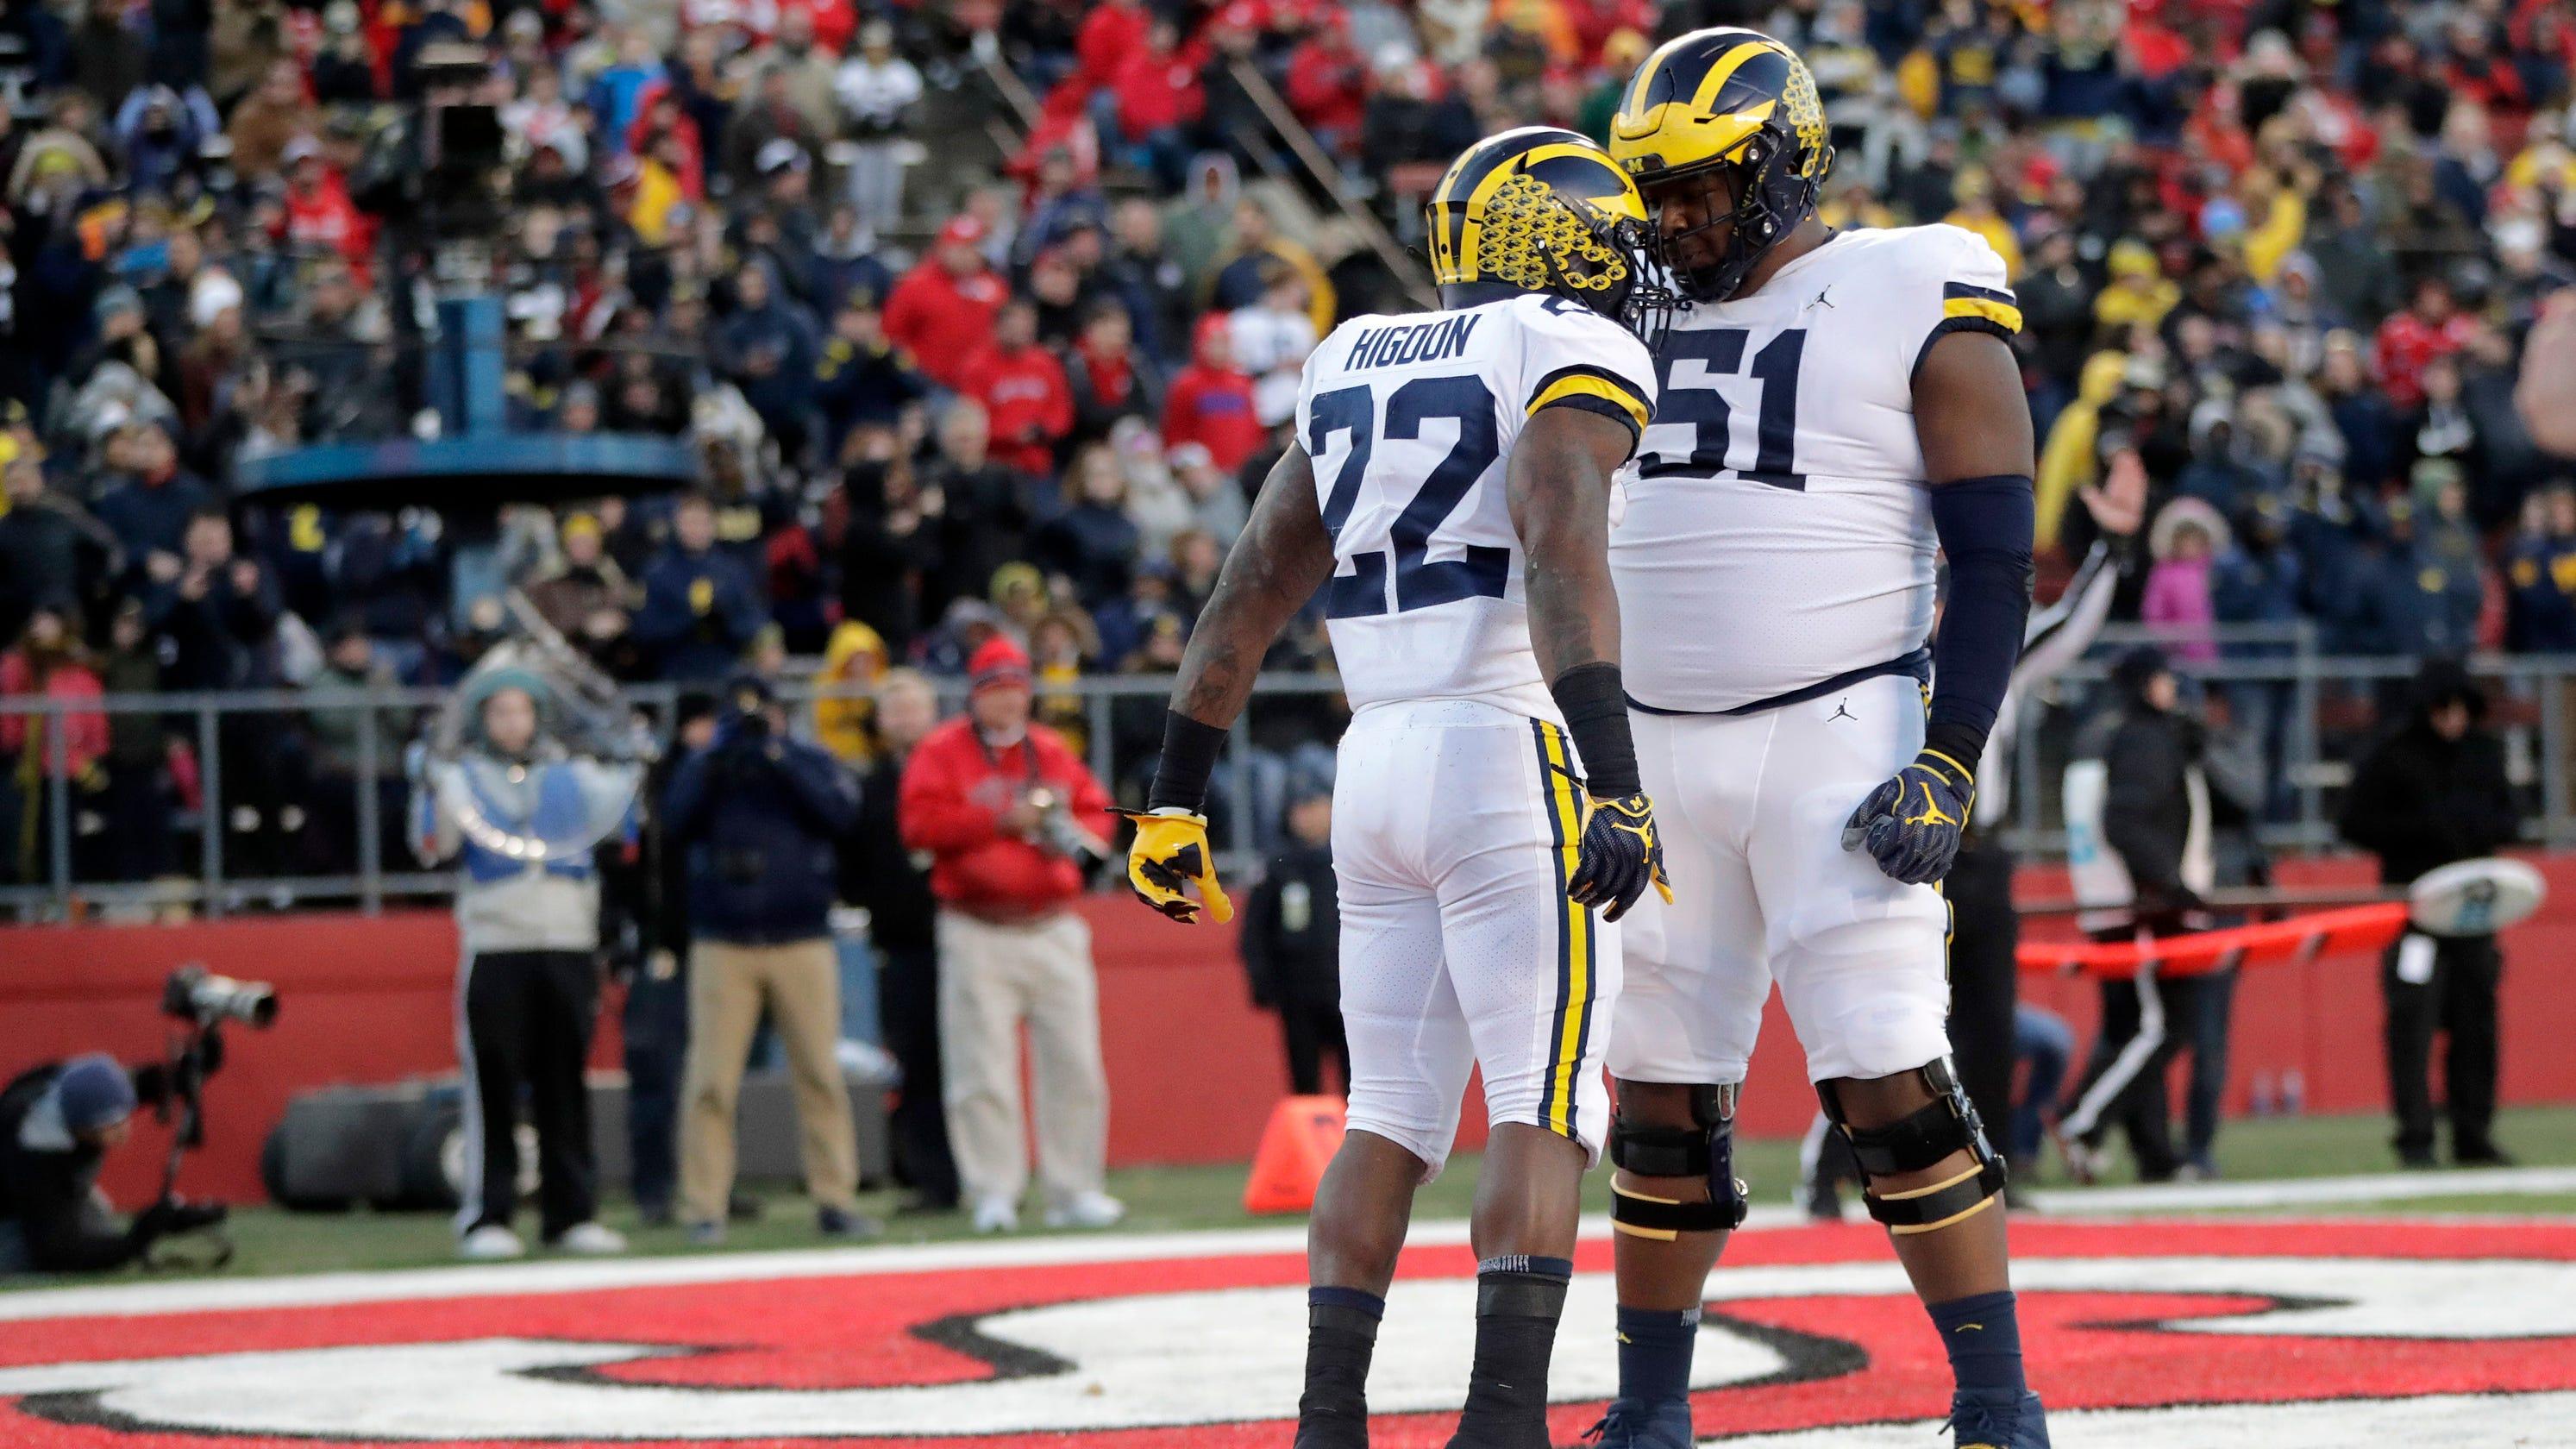 Michigan football vs. Indiana: Live blog, score updates